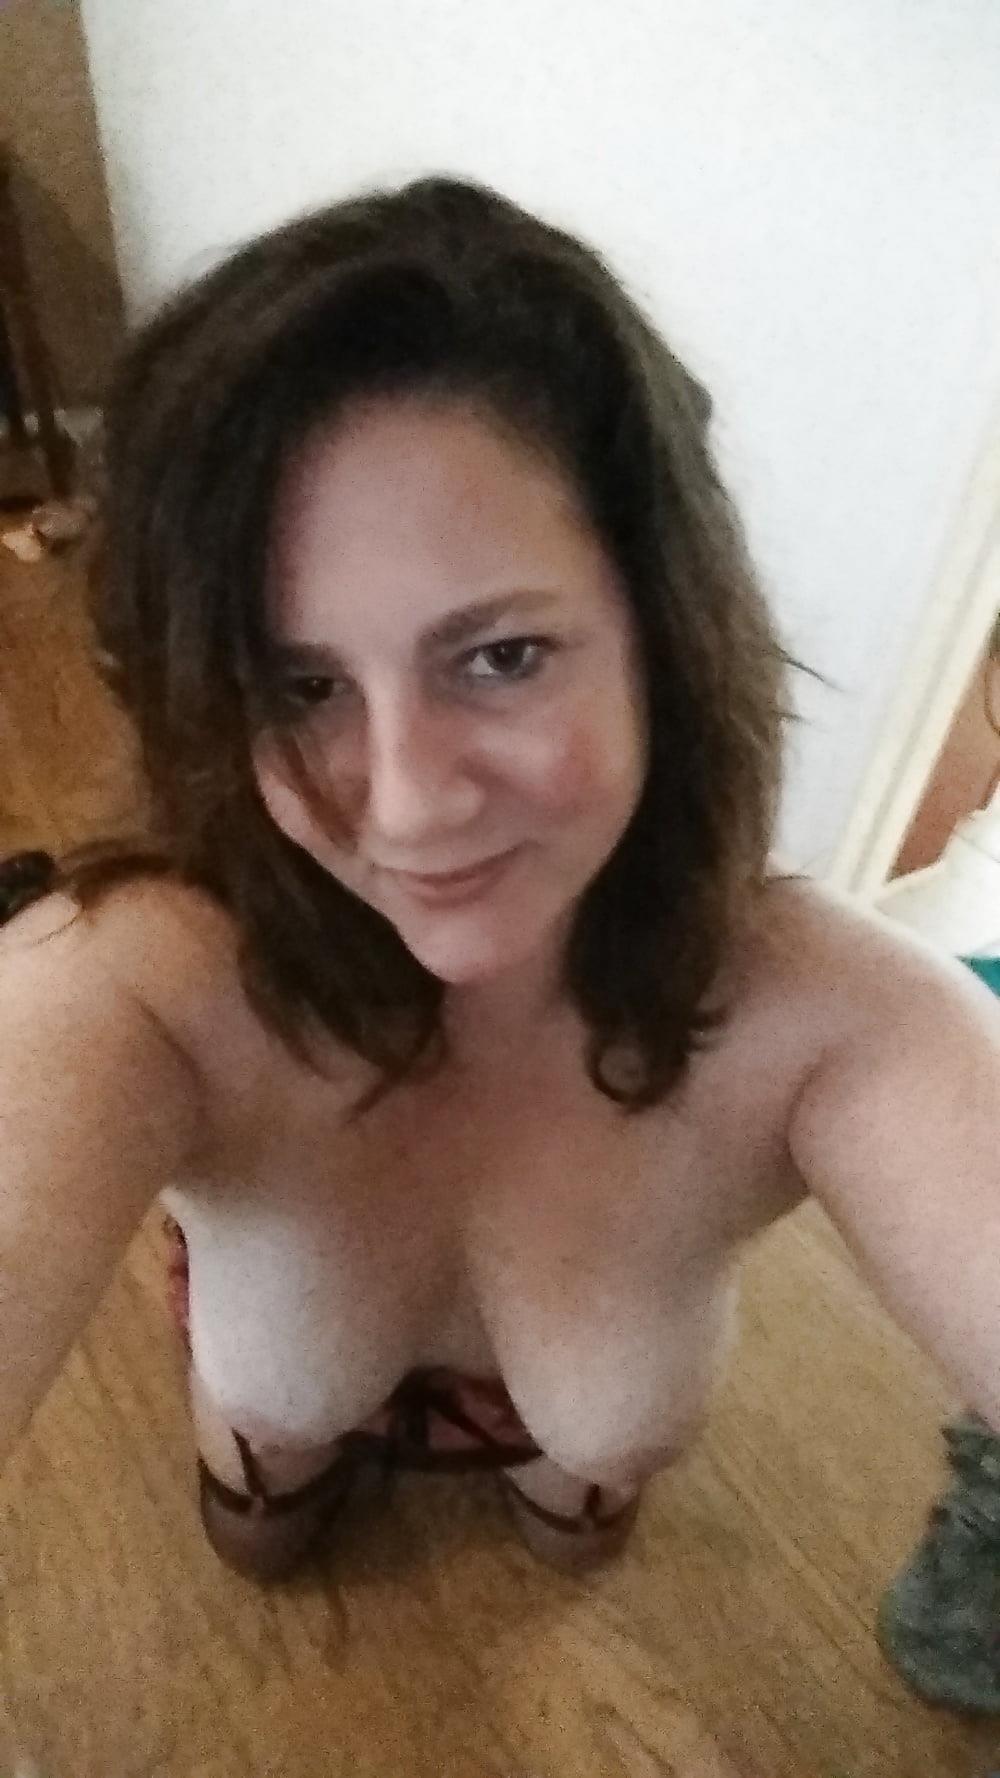 Hot amateur girls naked-5494